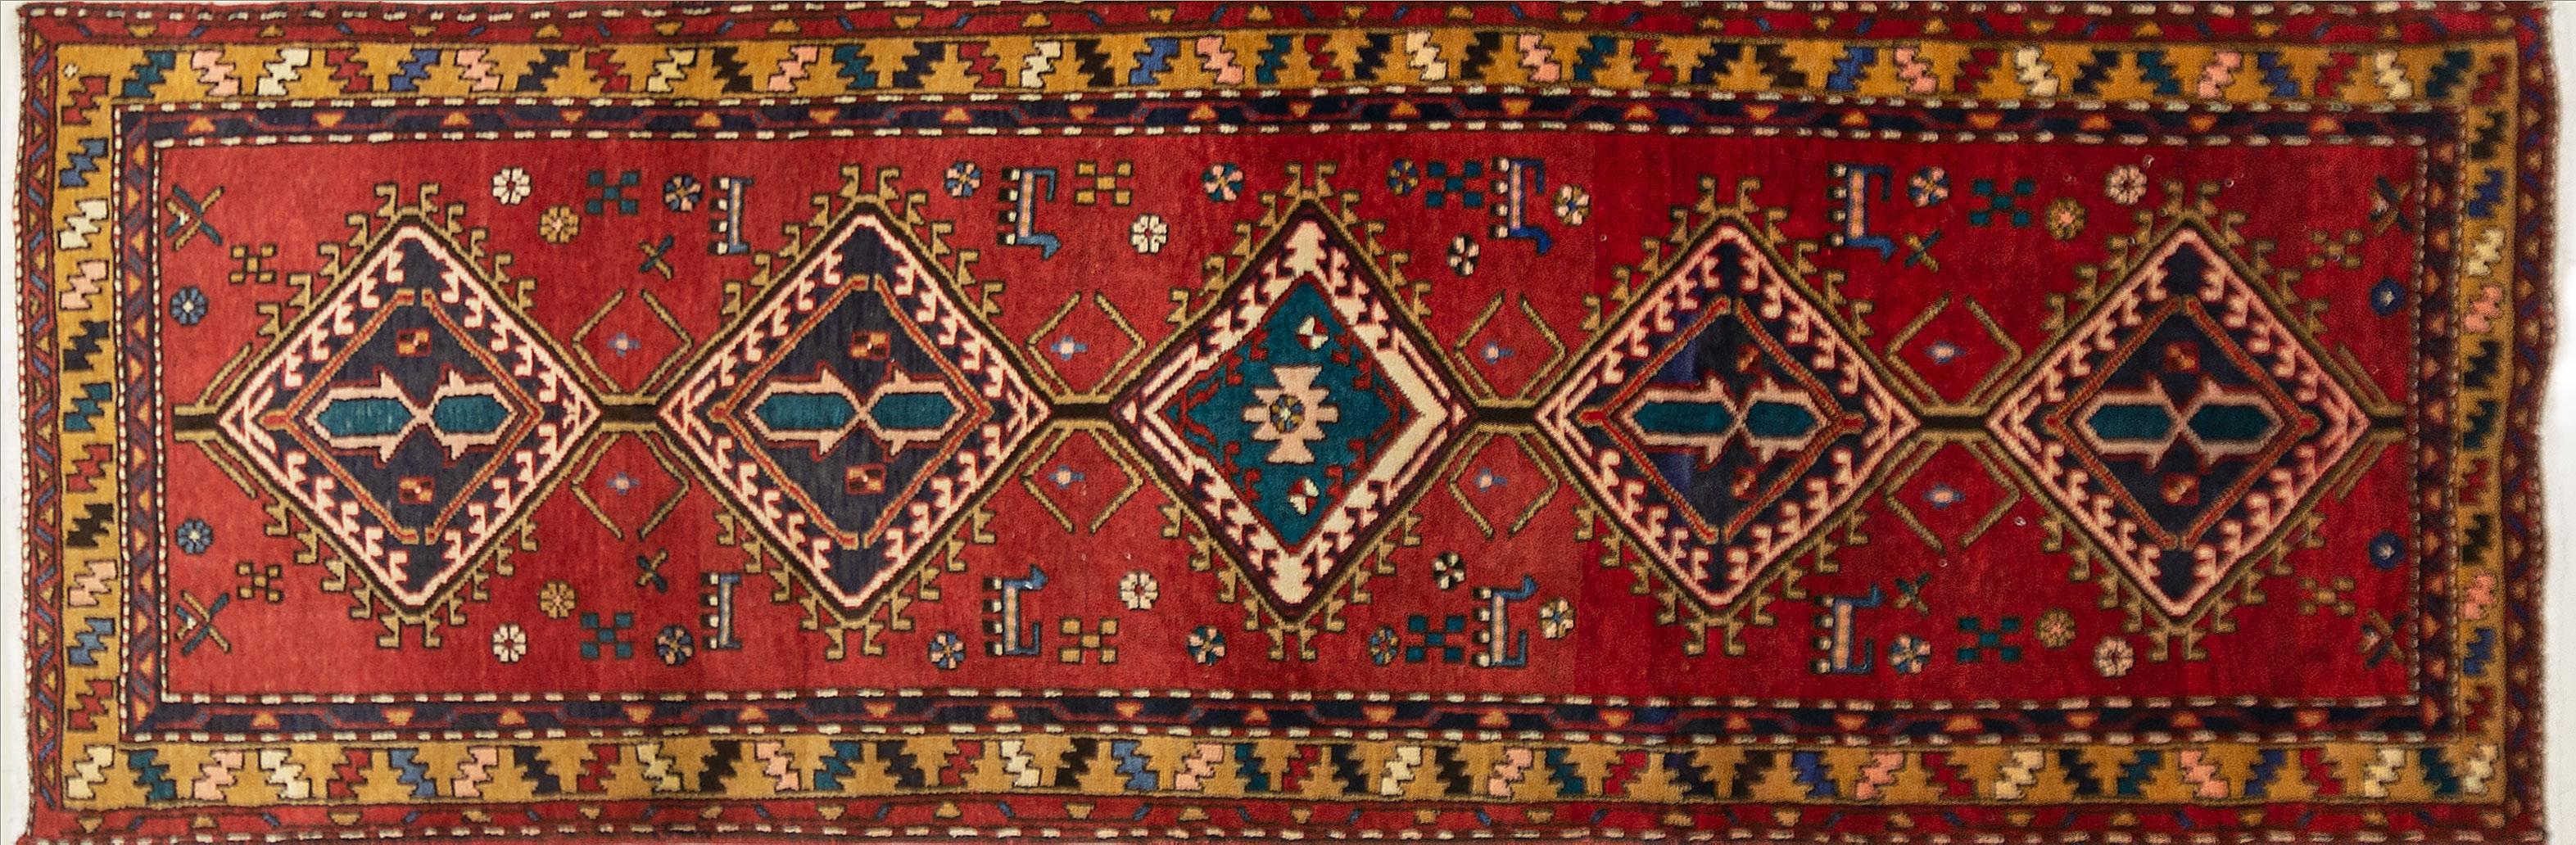 A Persian Hand Knotted Azari Runner, 290 x 97